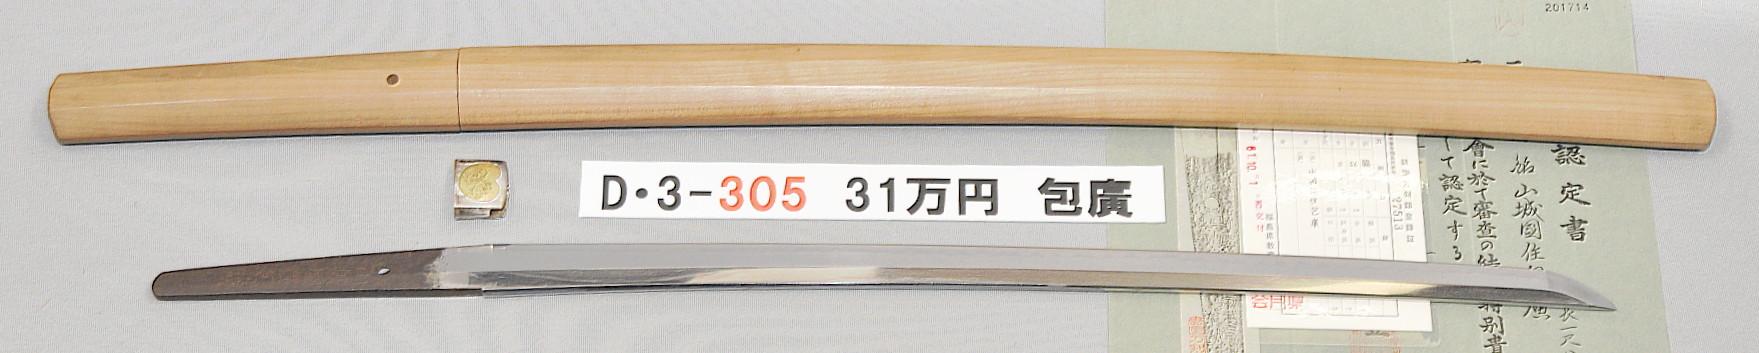 D3305